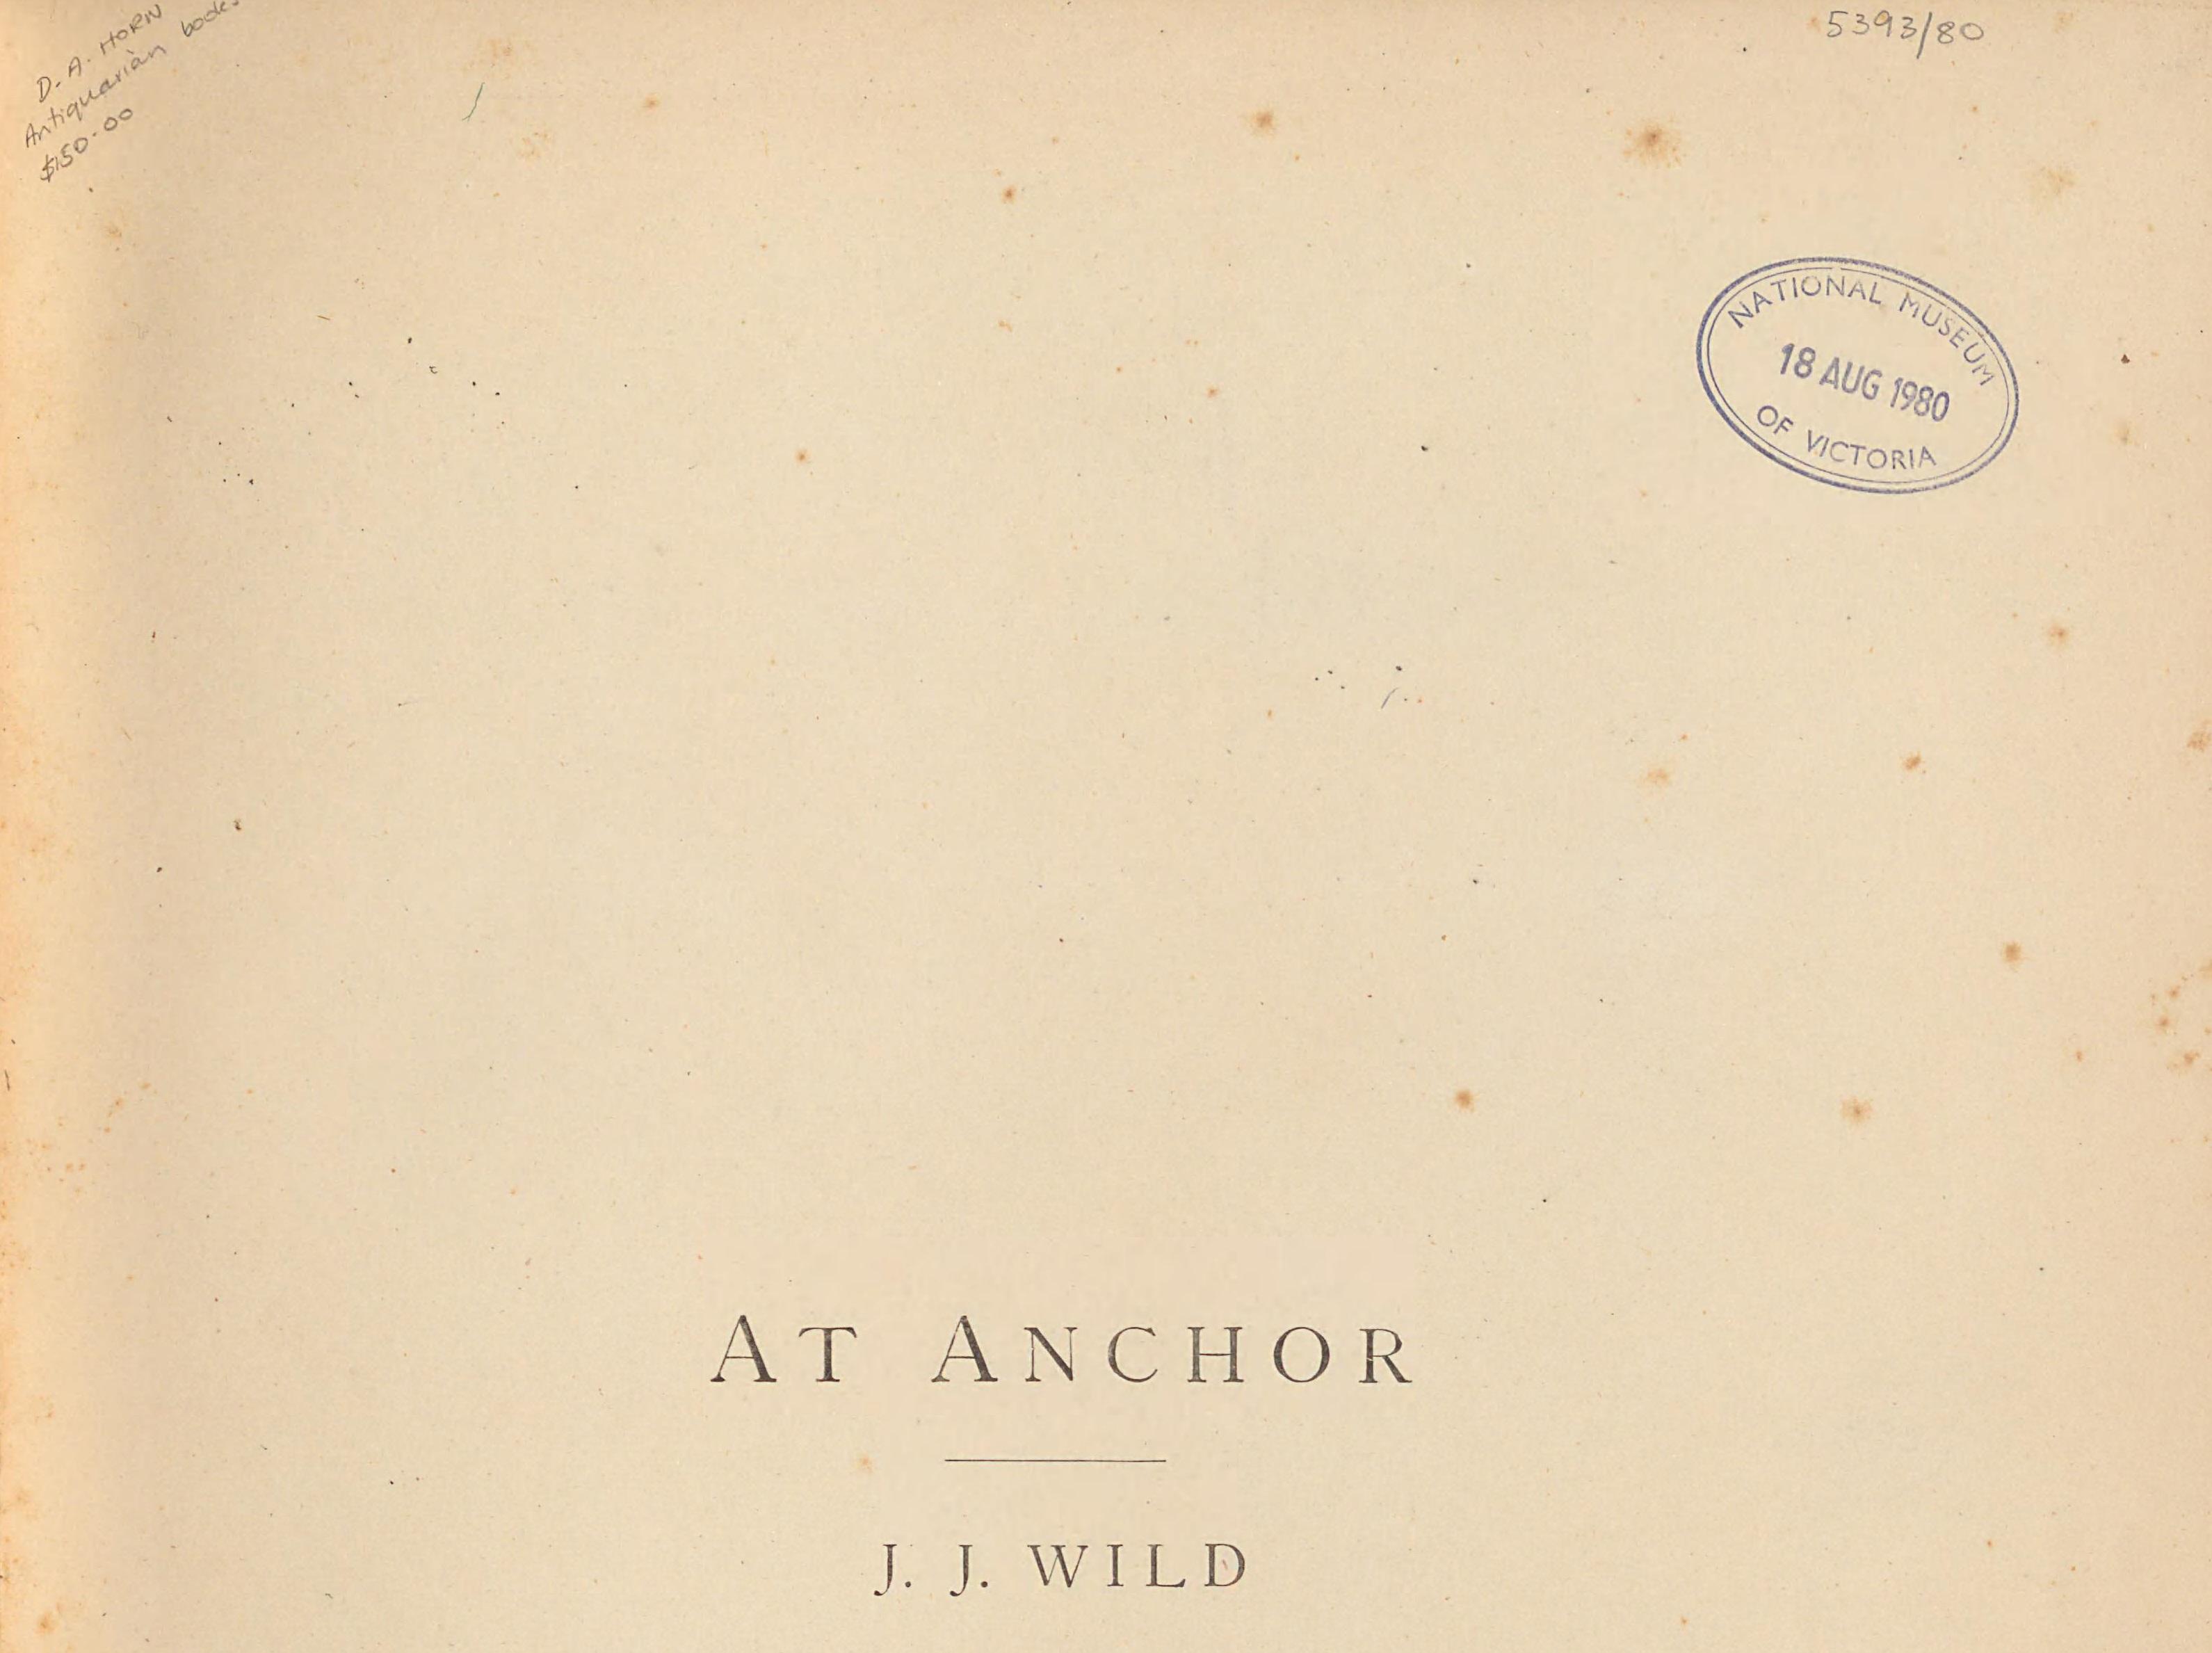 7. Archival References JJ Wild crop.jpg